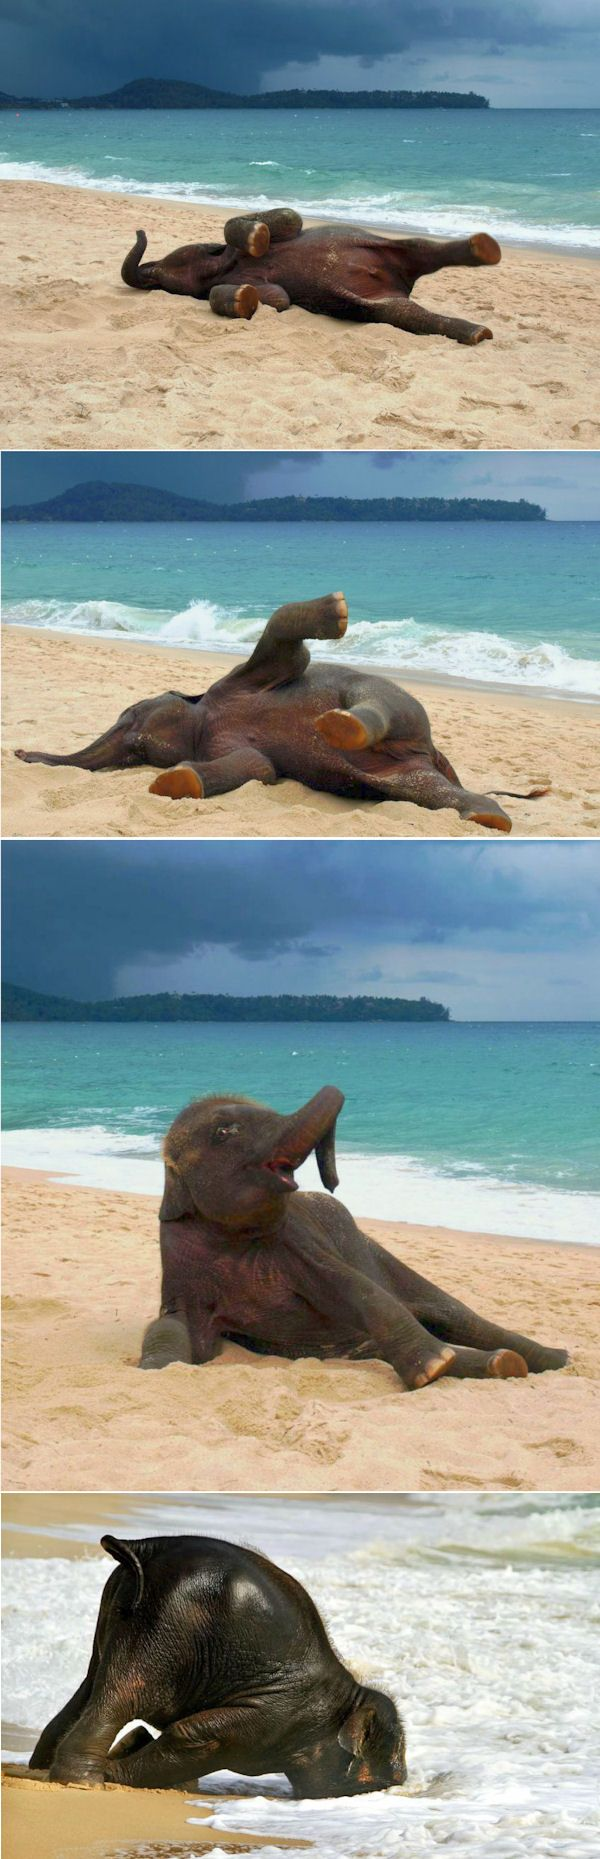 insolite eau elephant elephanteau plage sable